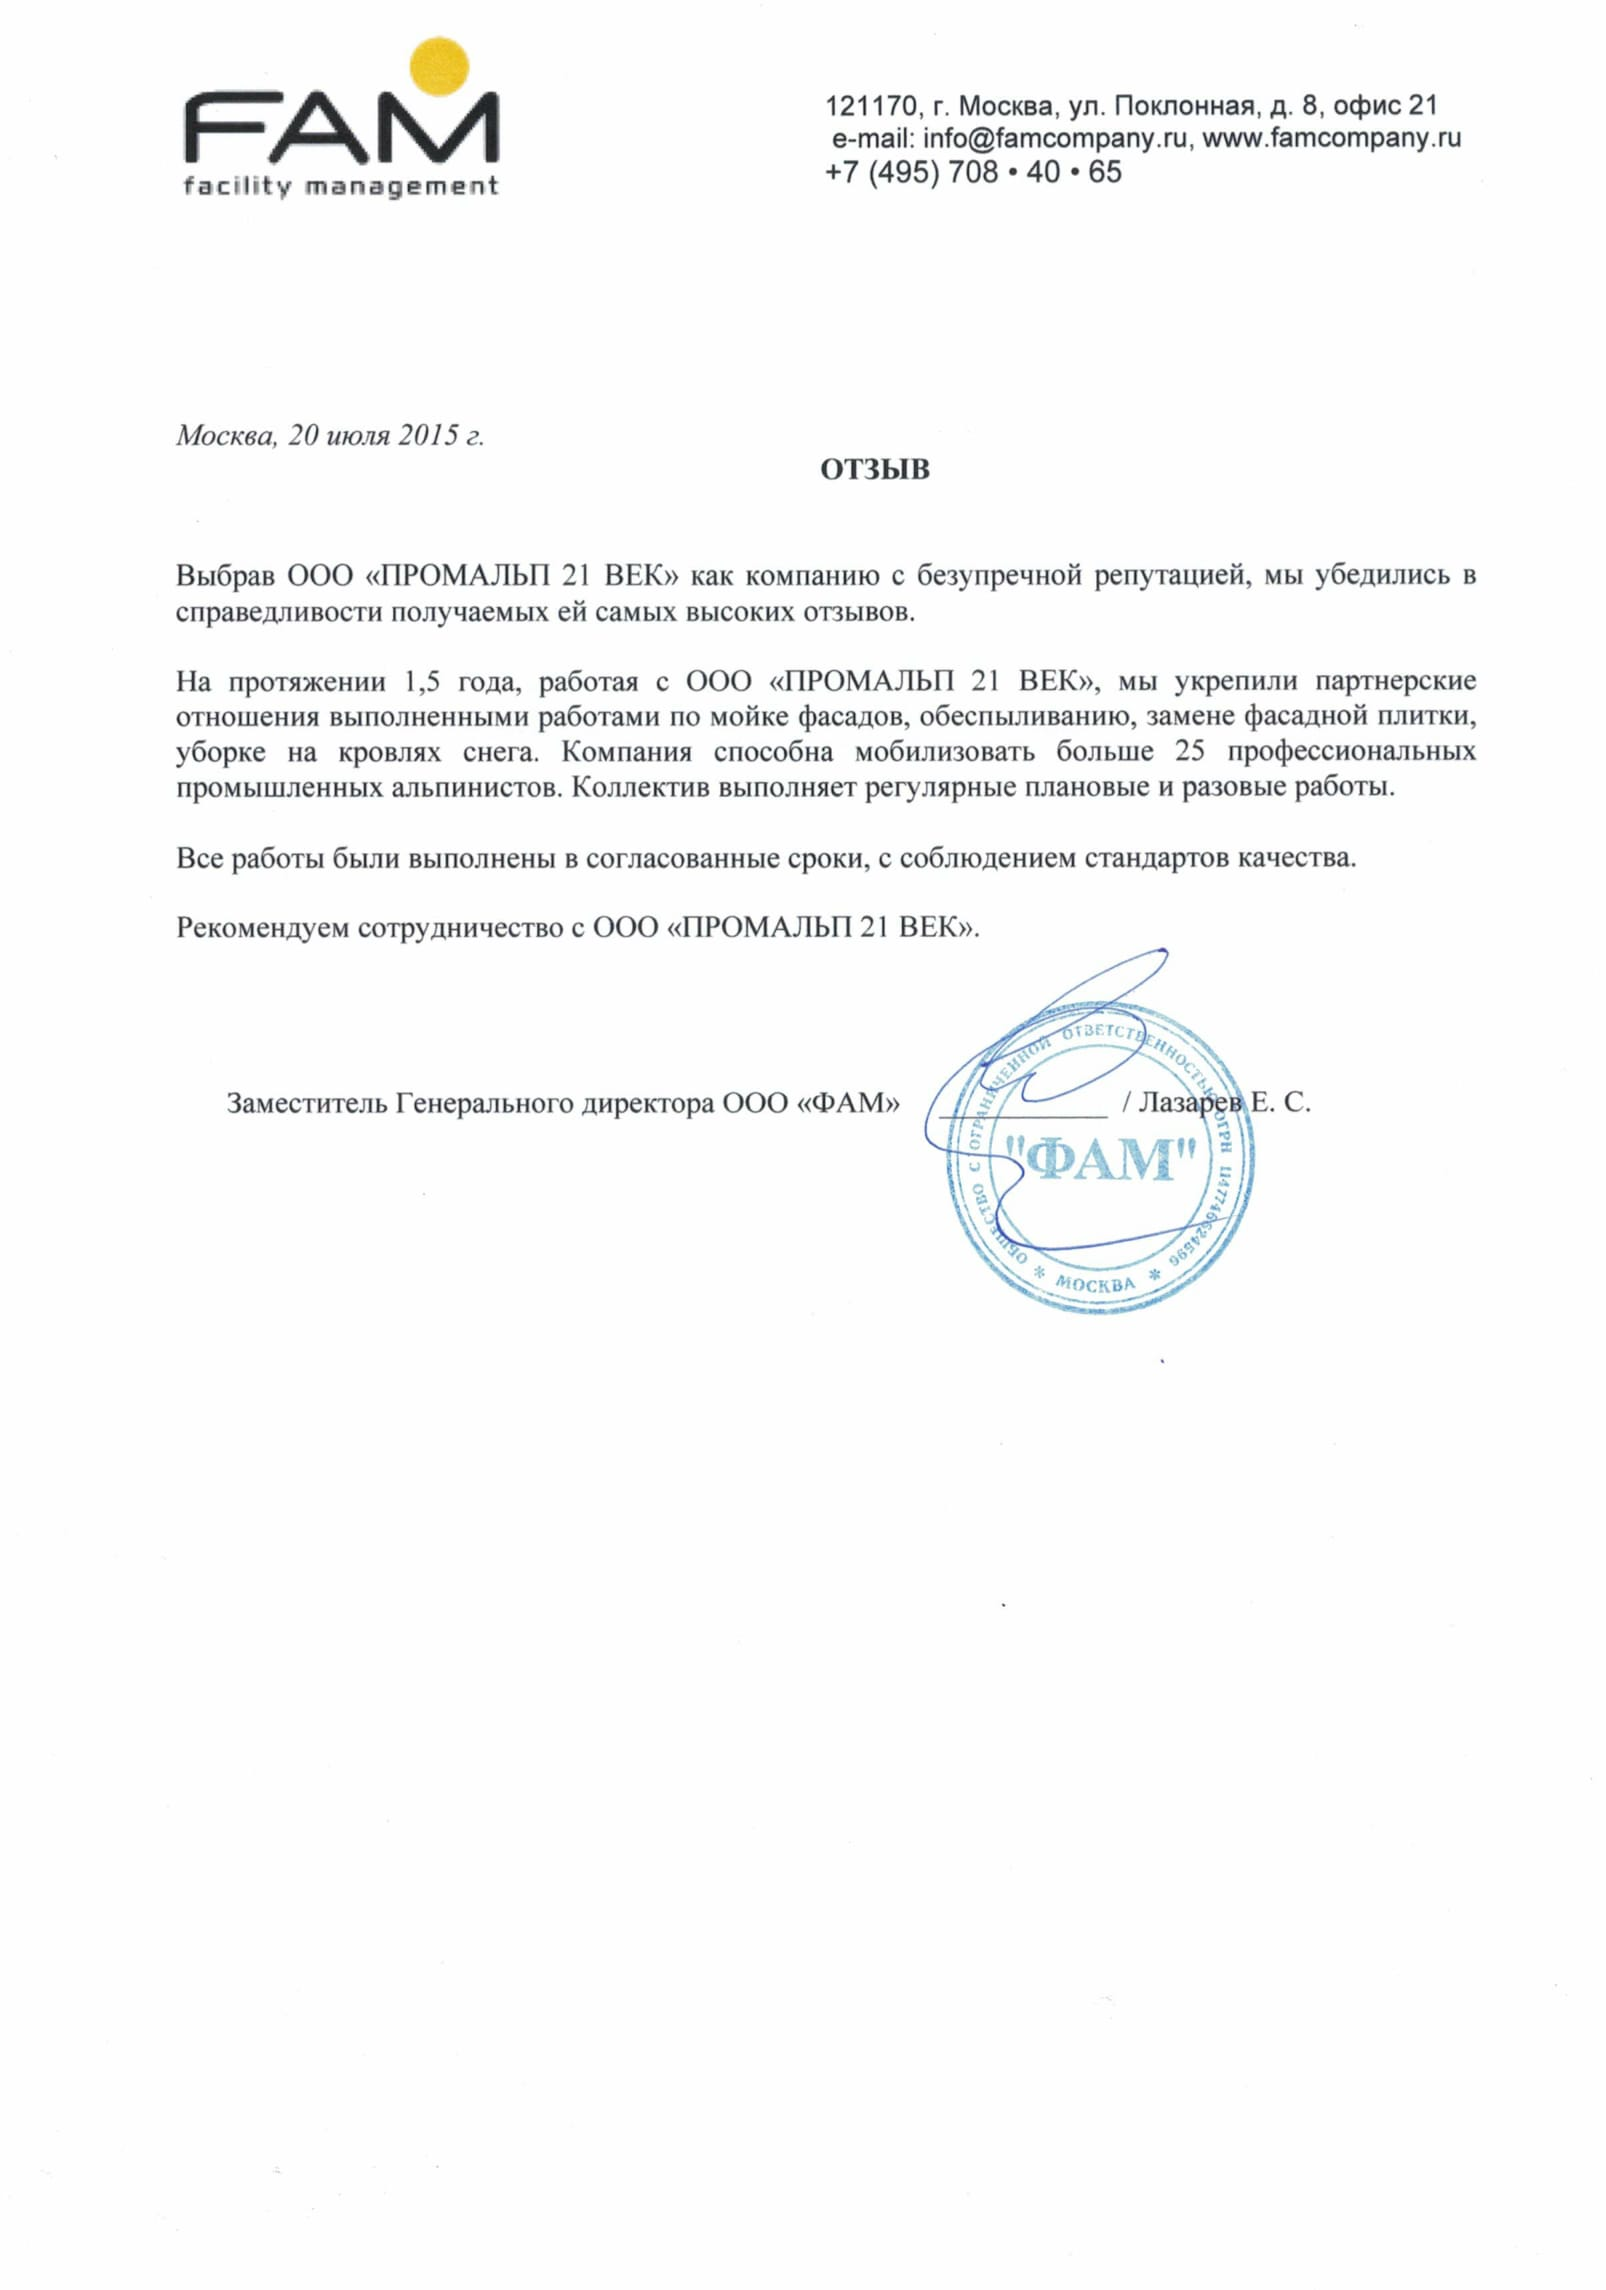 "ООО ""ФАМ"" – Отзыв"